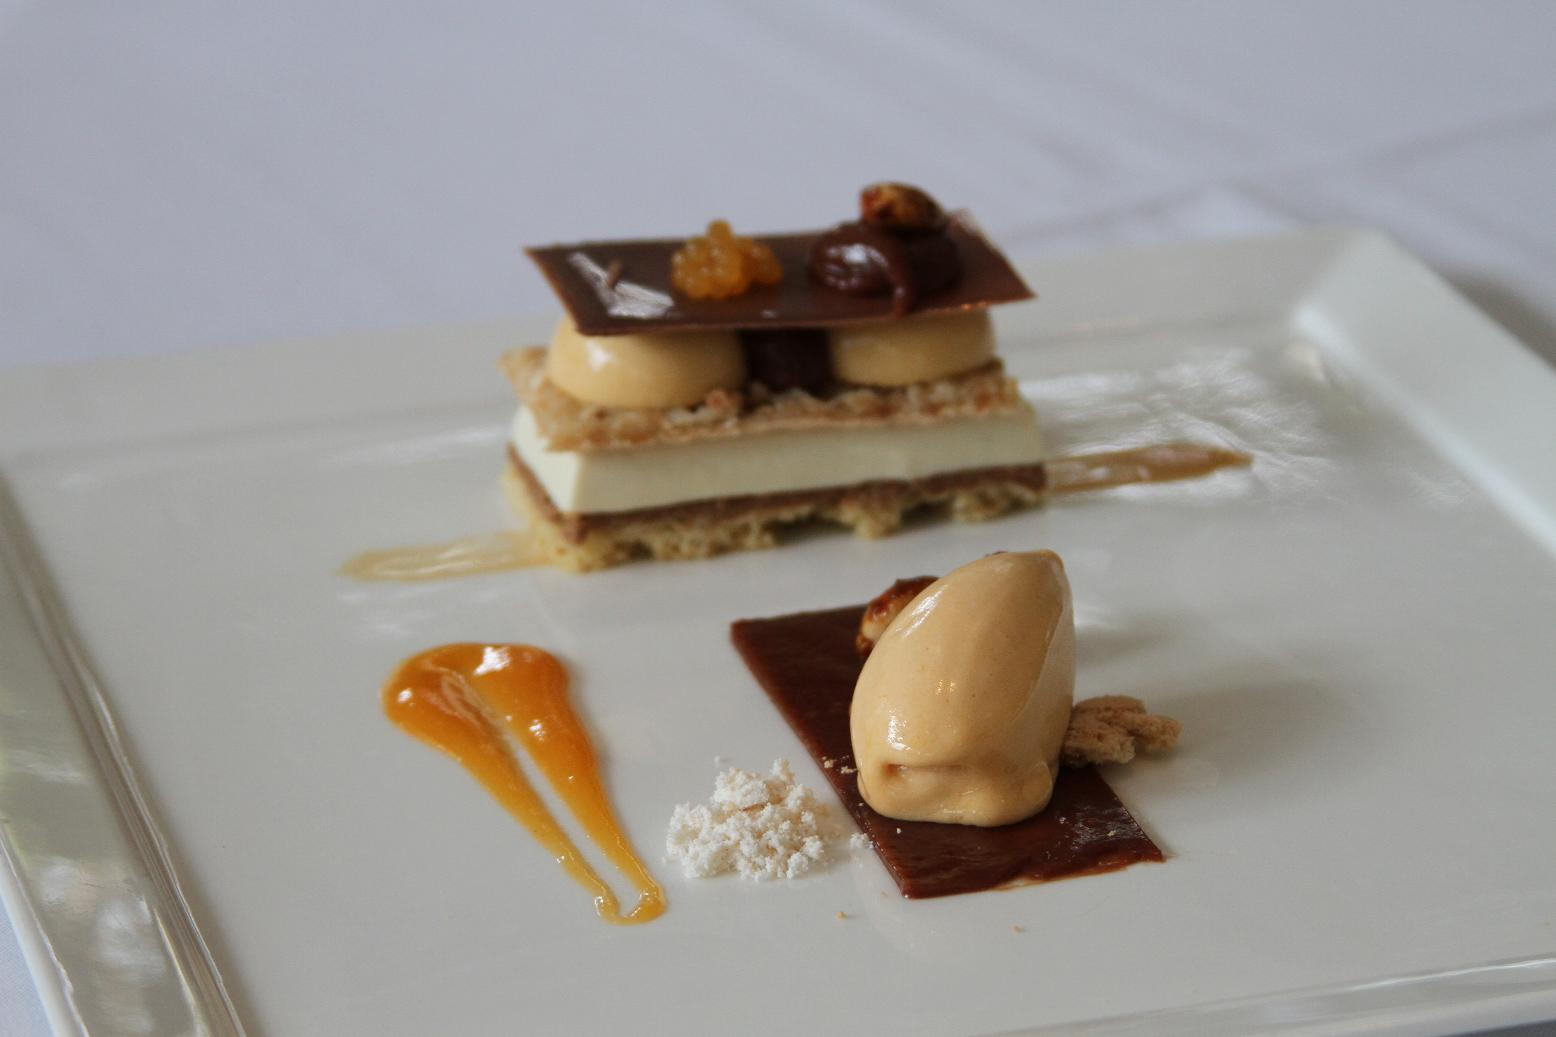 Chef Satterwhite's Almond Apricot Harmony